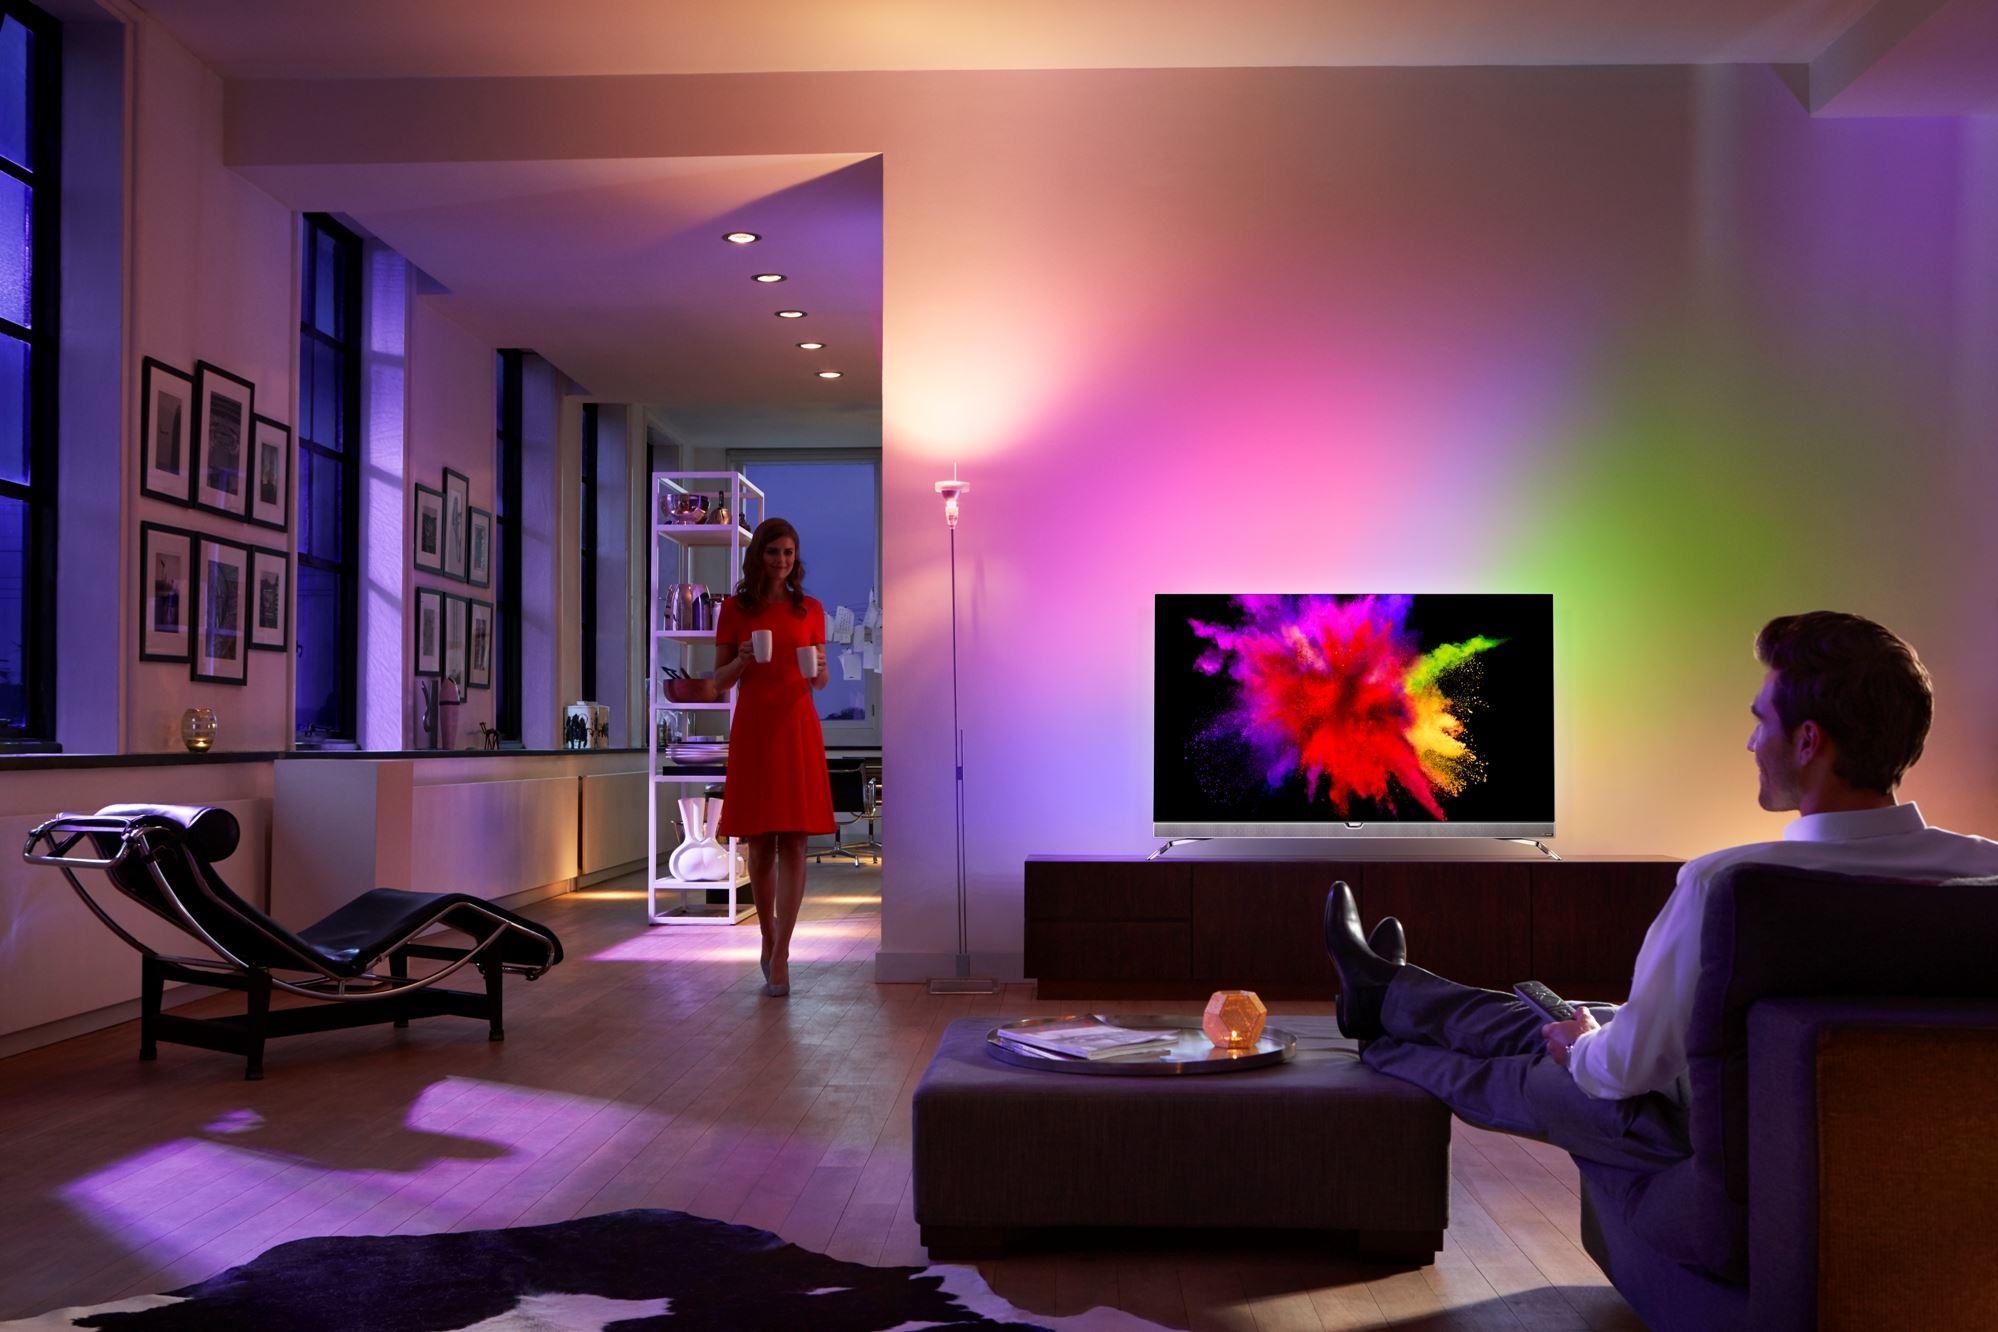 Philips POS901F – Testujemy pierwszy OLED z Ambilight i Android TV